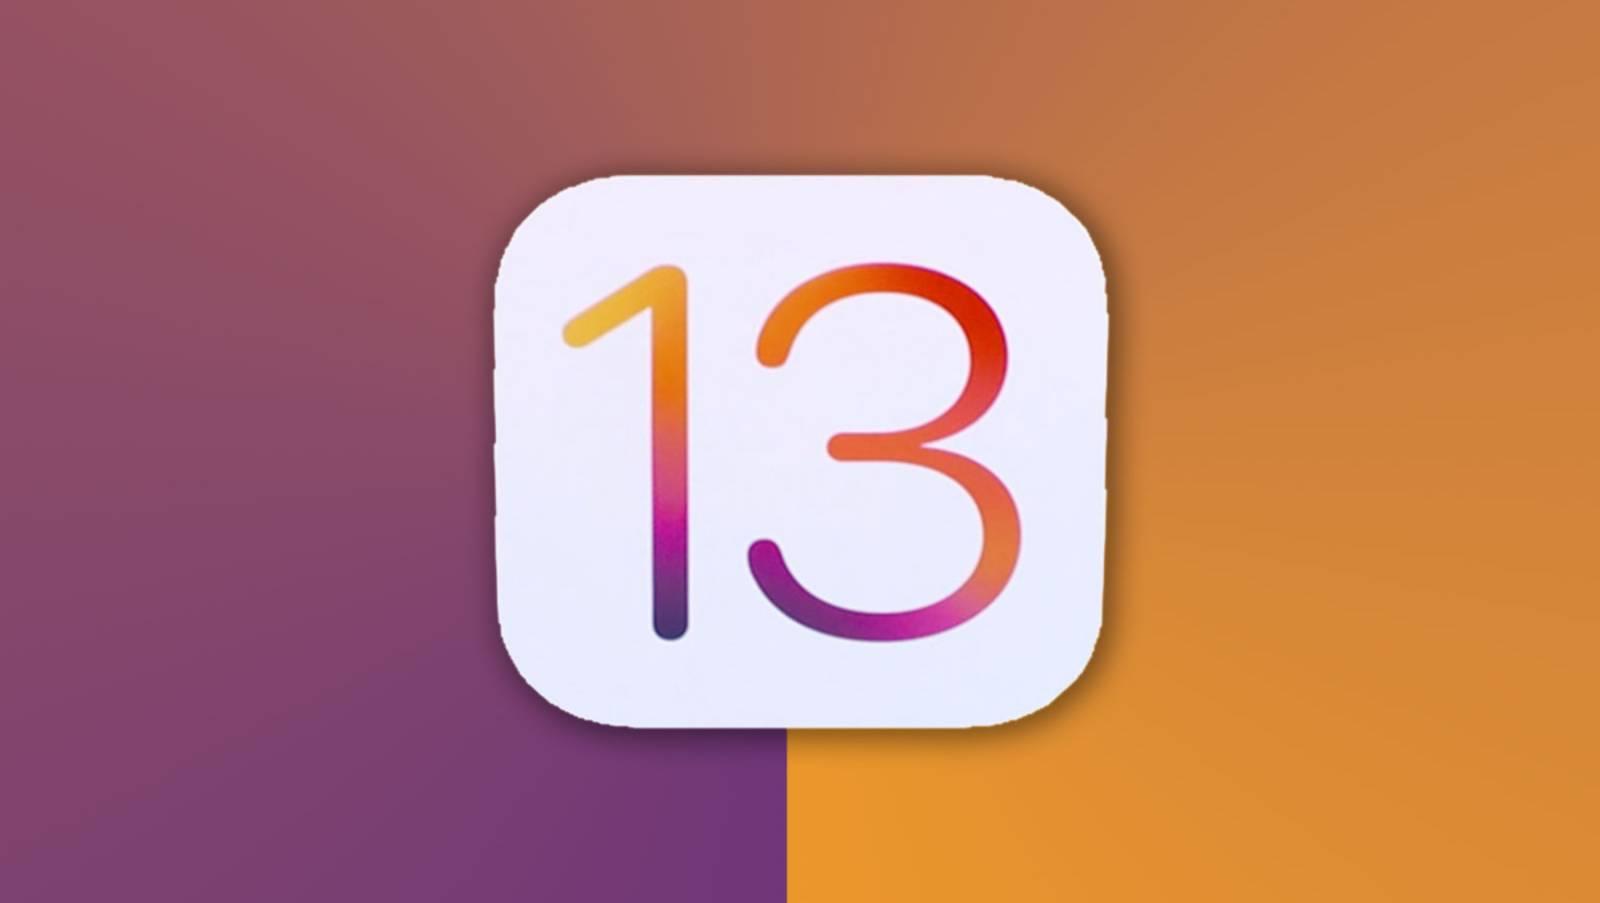 iOS 13 Dezvaluie MARELE Produs SECRET Pregatit de catre Apple